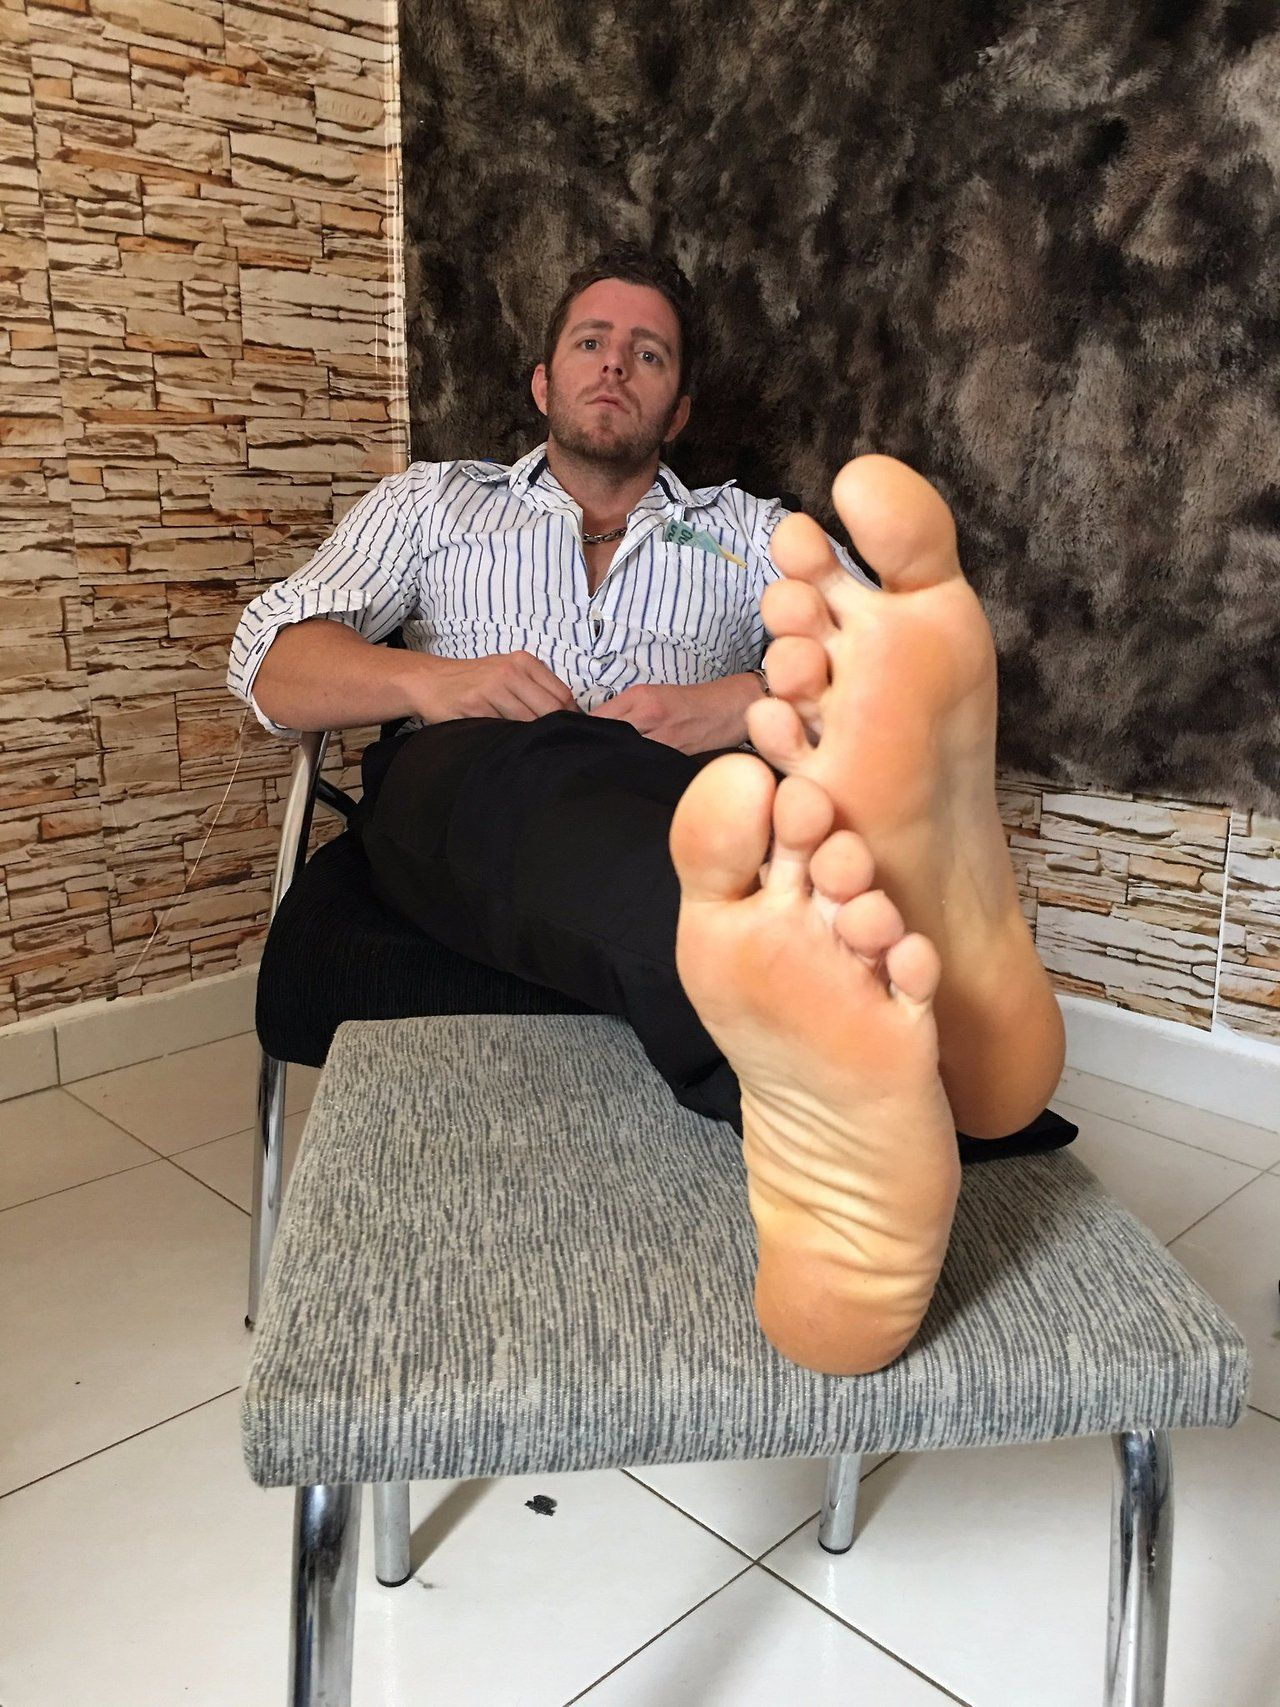 Pin Fred Flinstone Bare Feet Long Pants Suits